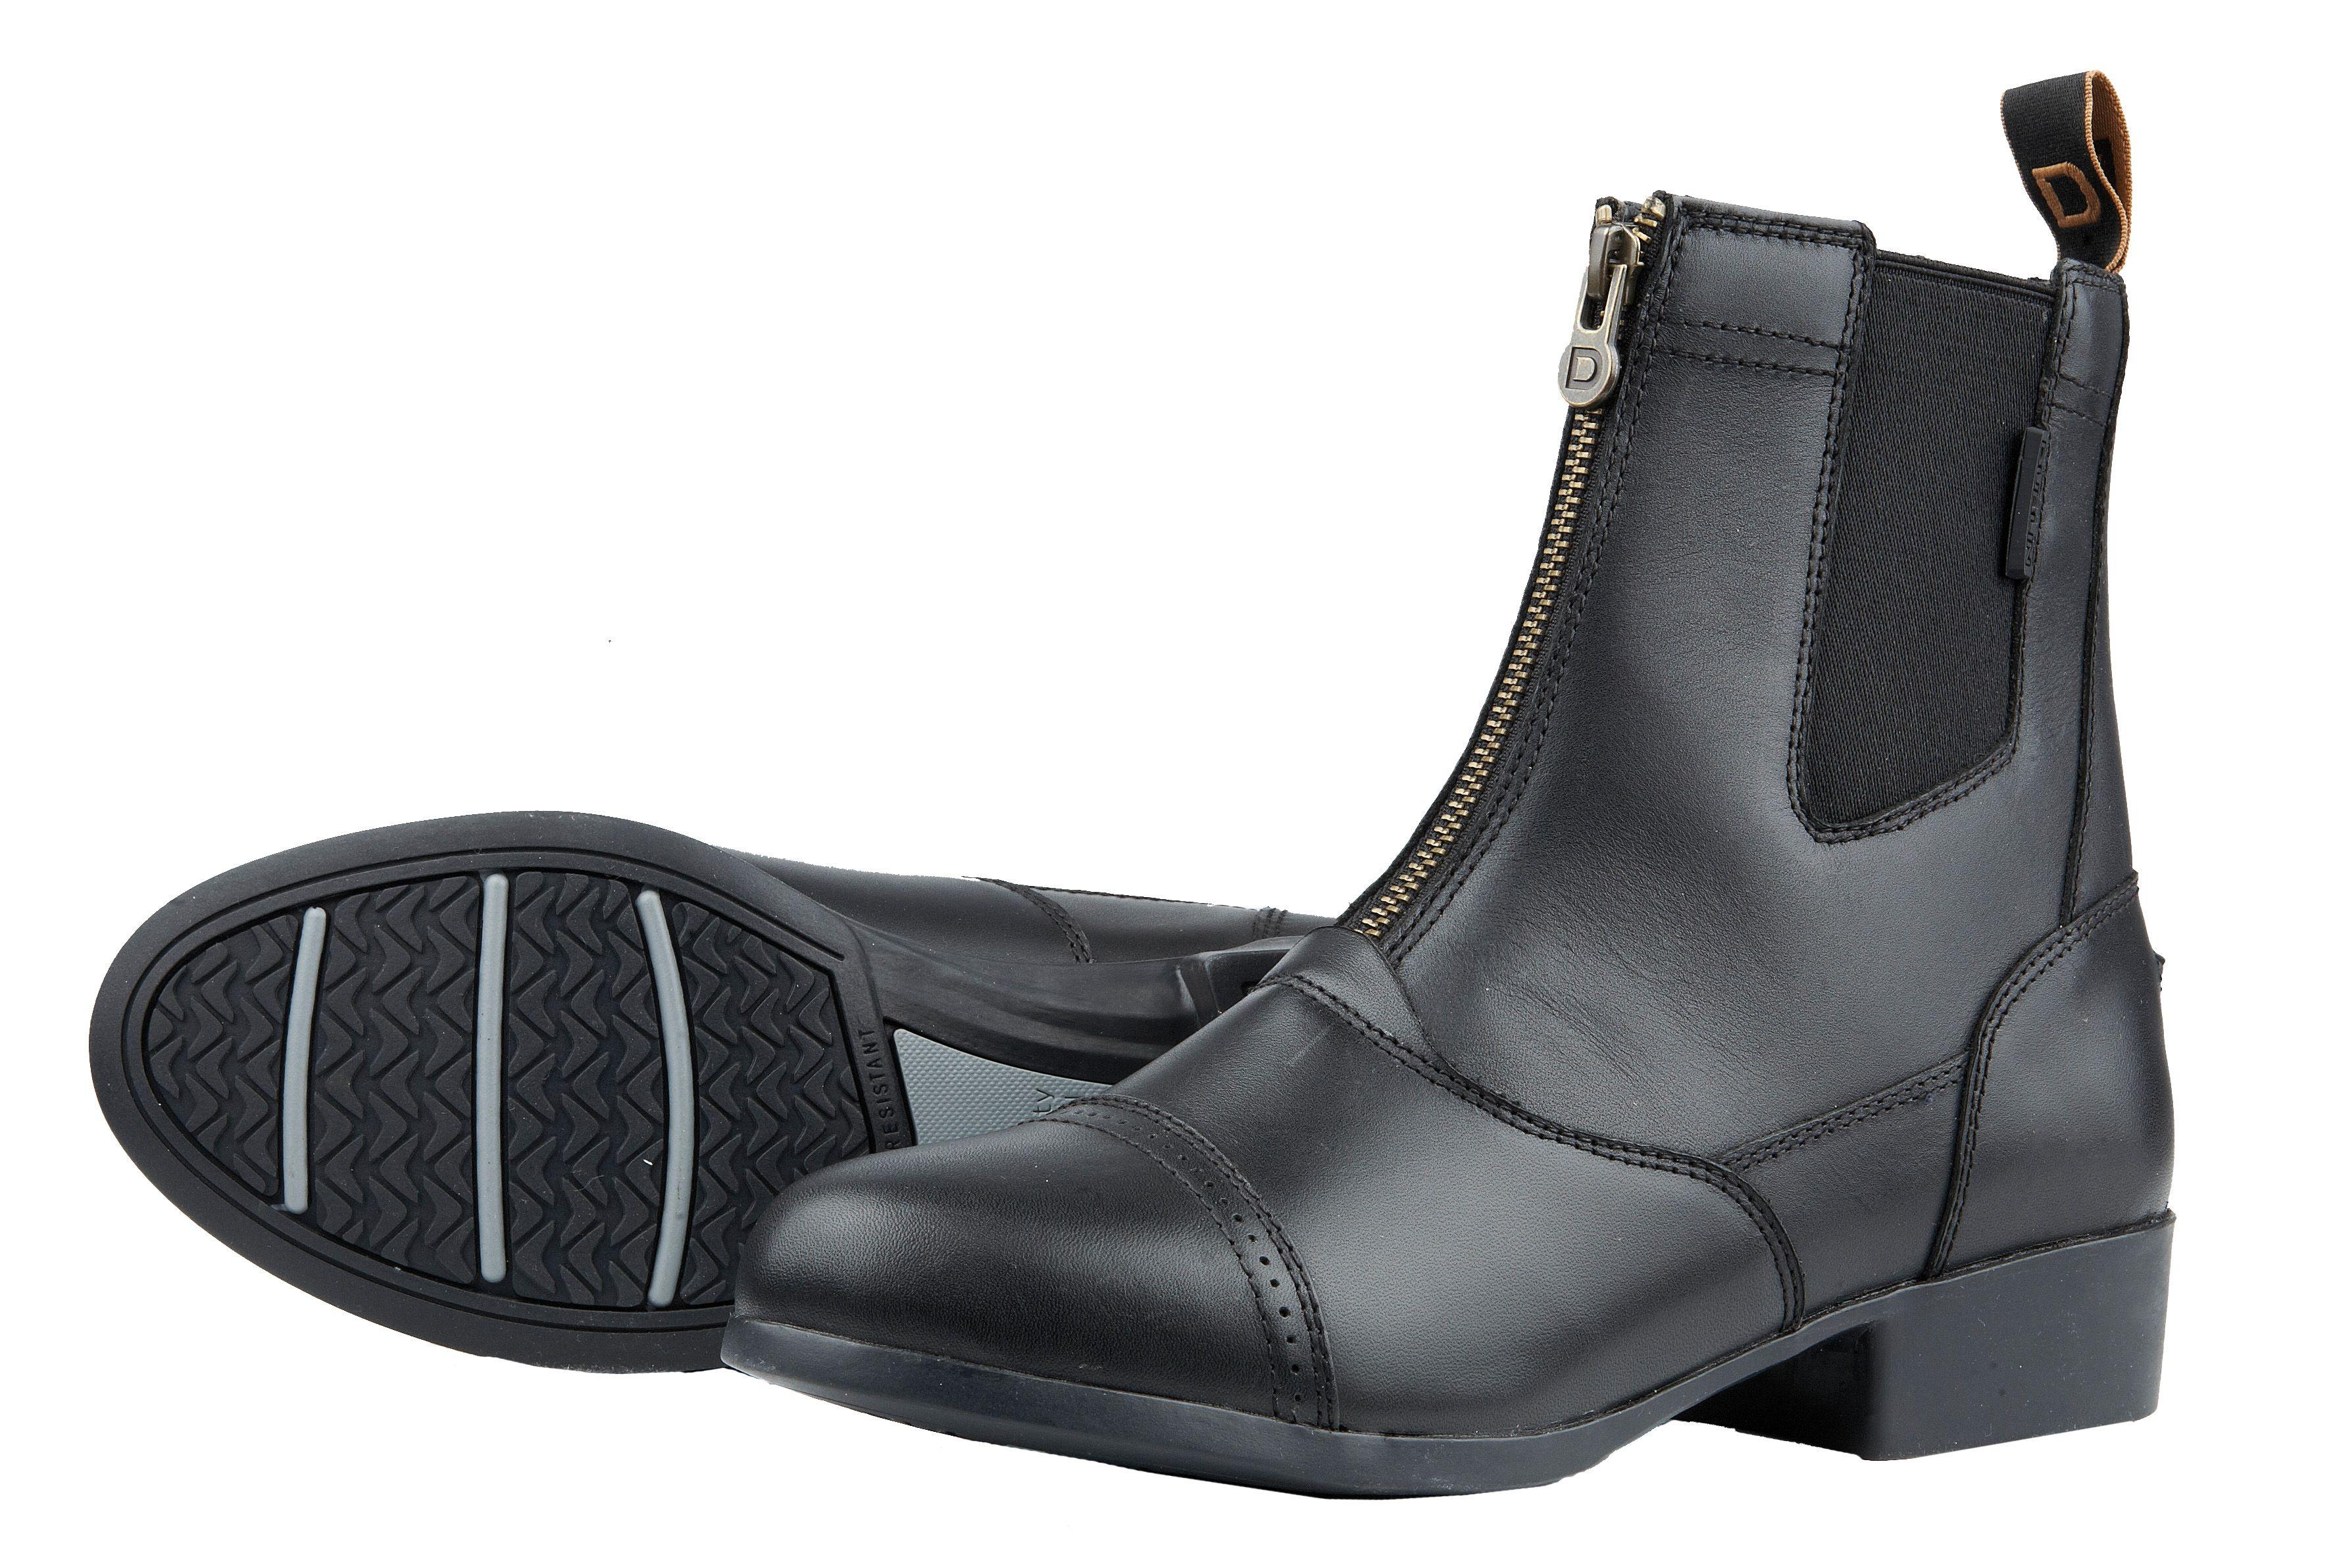 Dublin Summit Zip Paddock Boots - Ladies